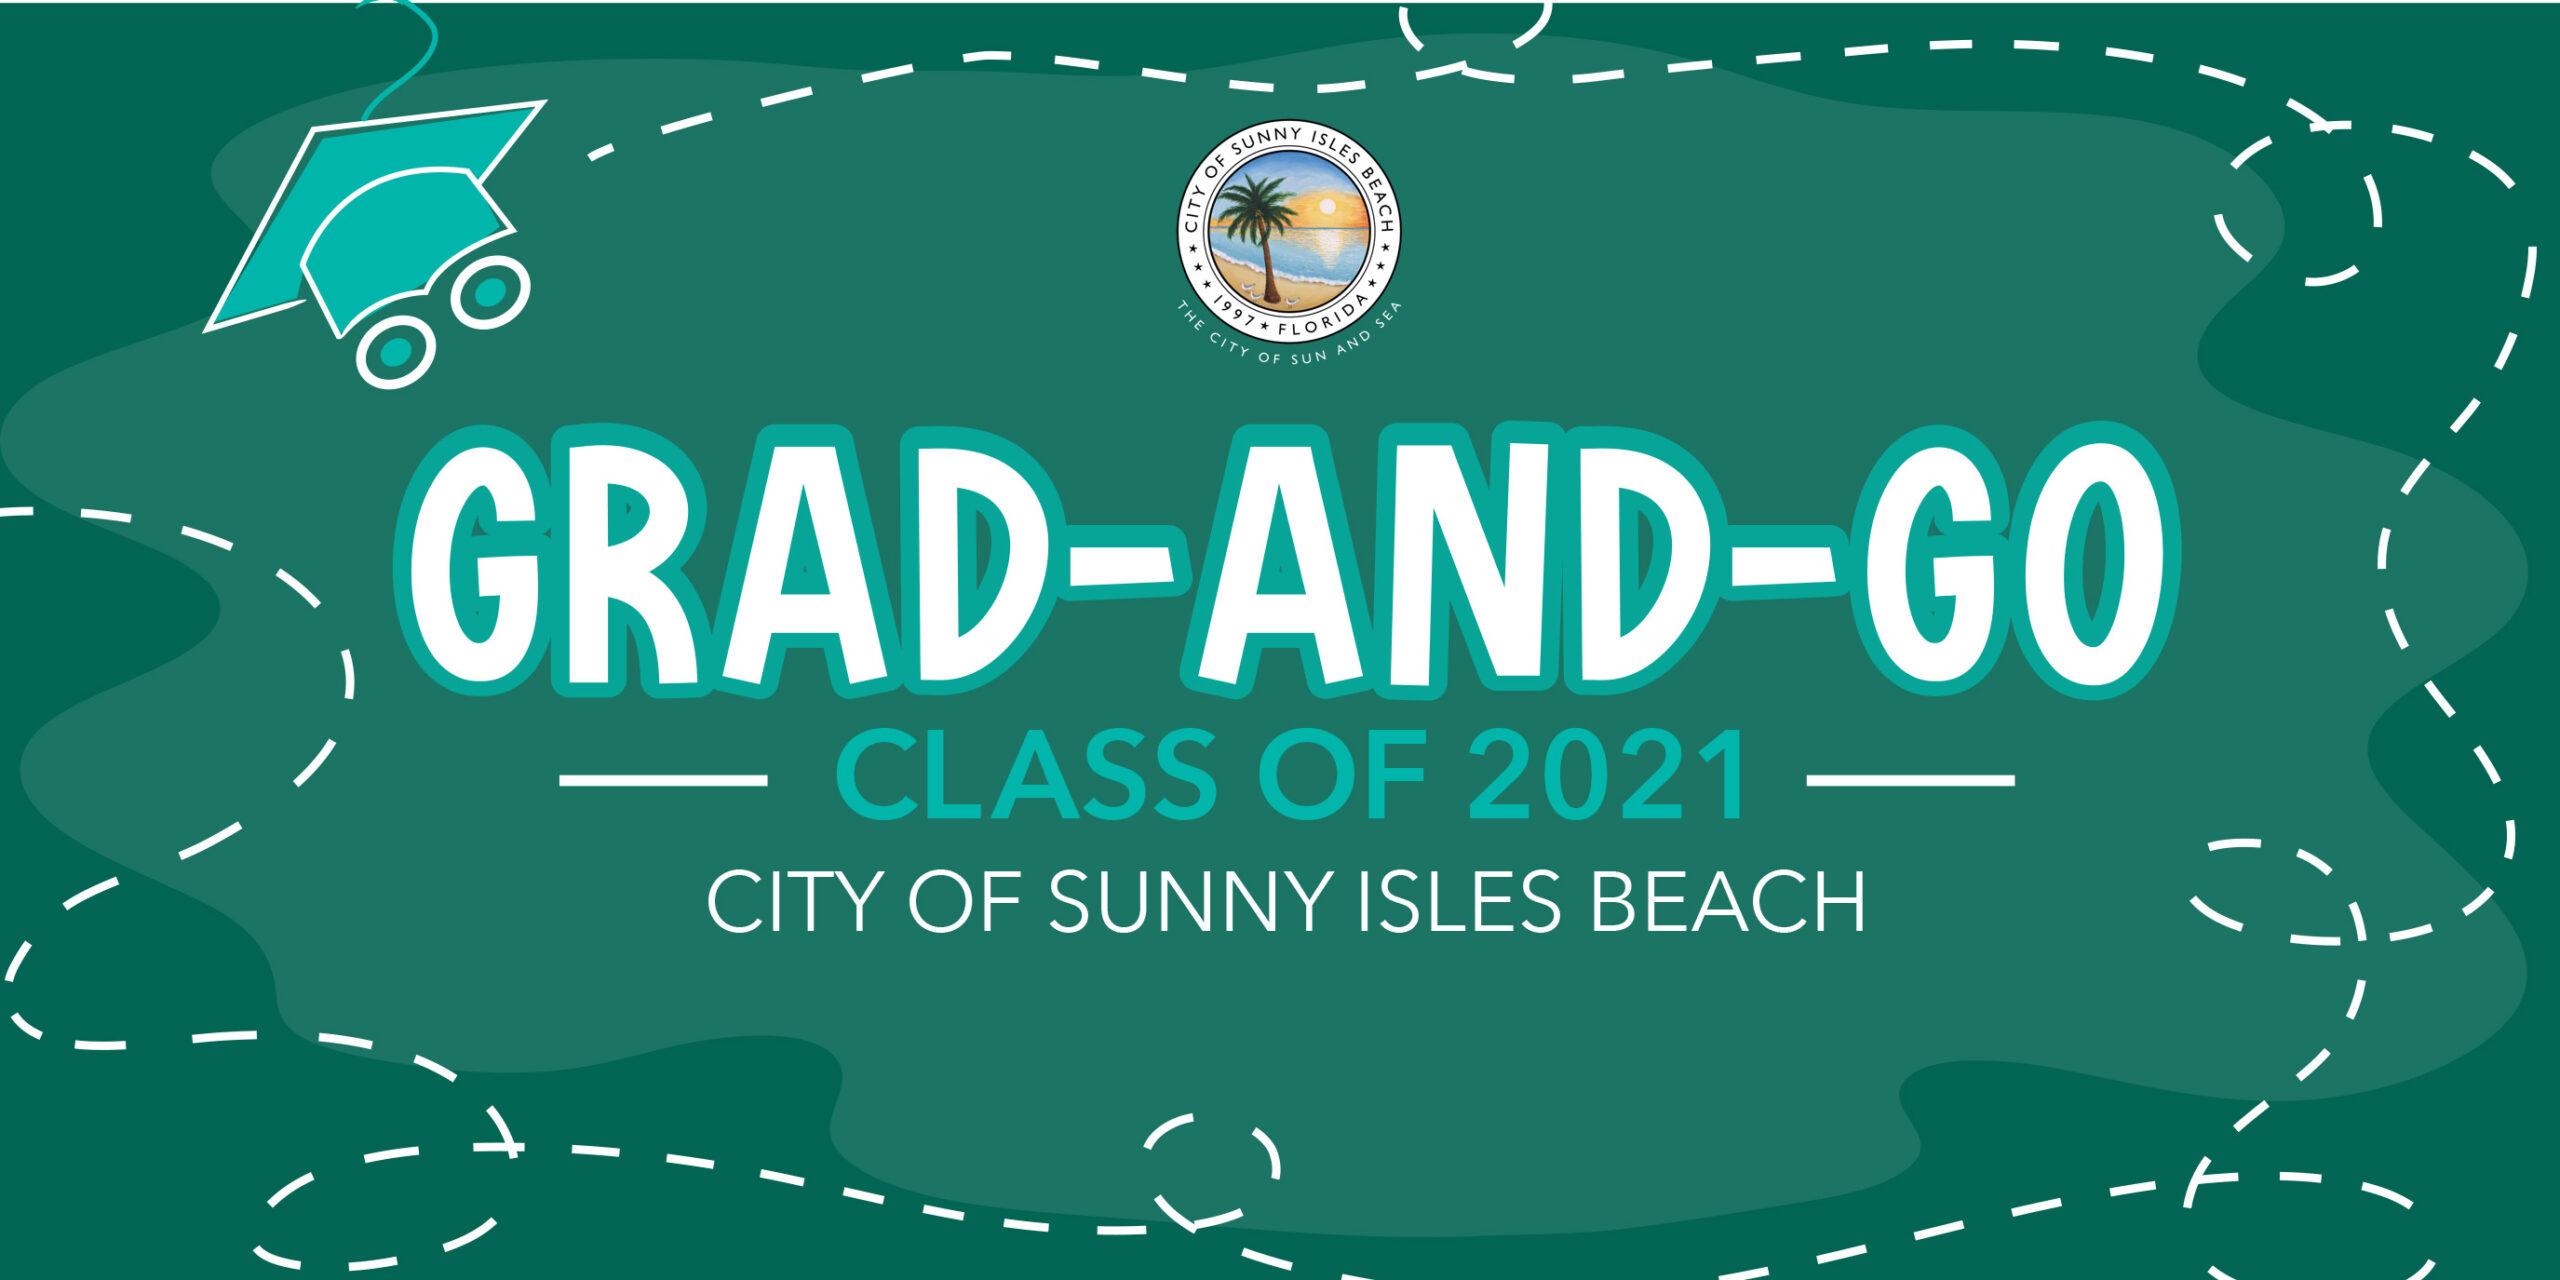 GRAD-AND-GO Class of 2021. City of Sunny Isles Beach